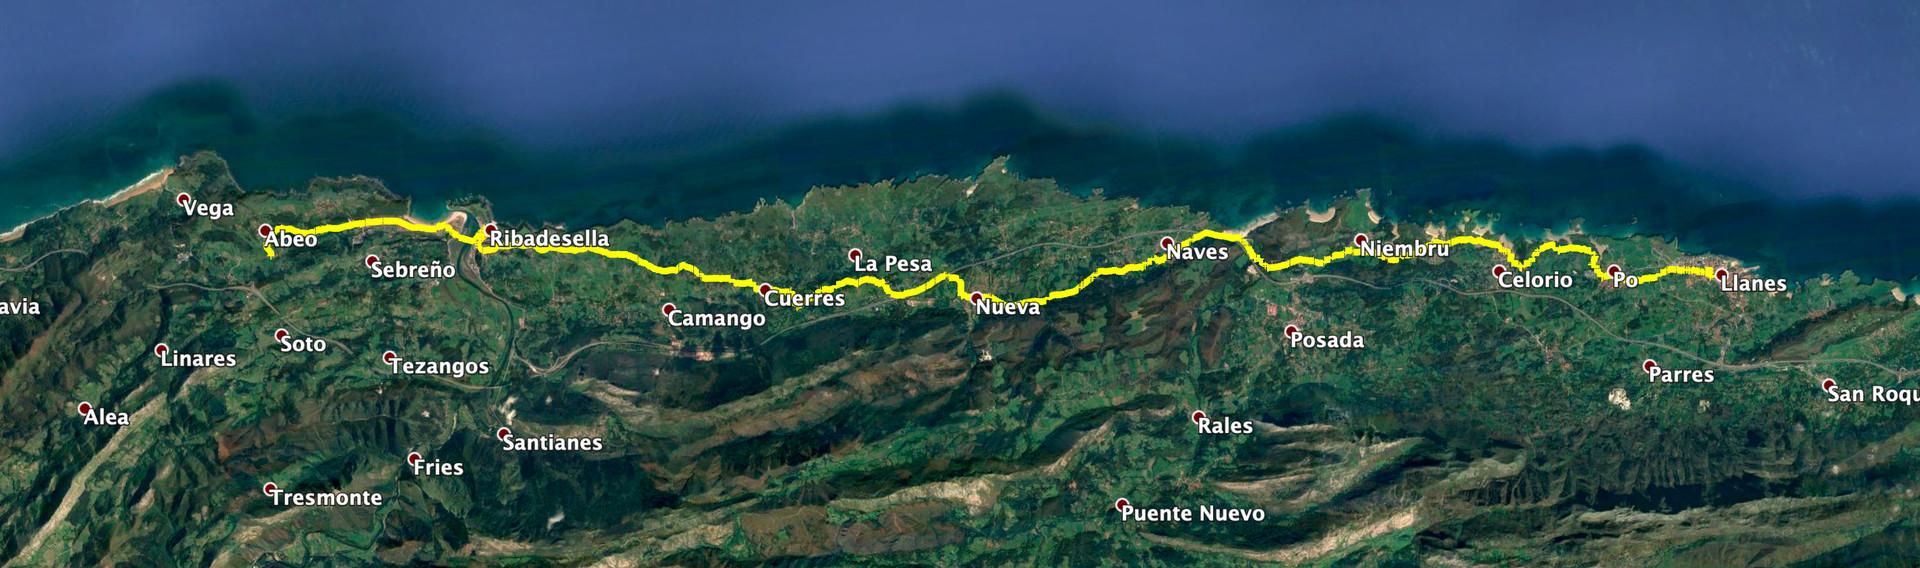 CN Day 16 Map.jpg